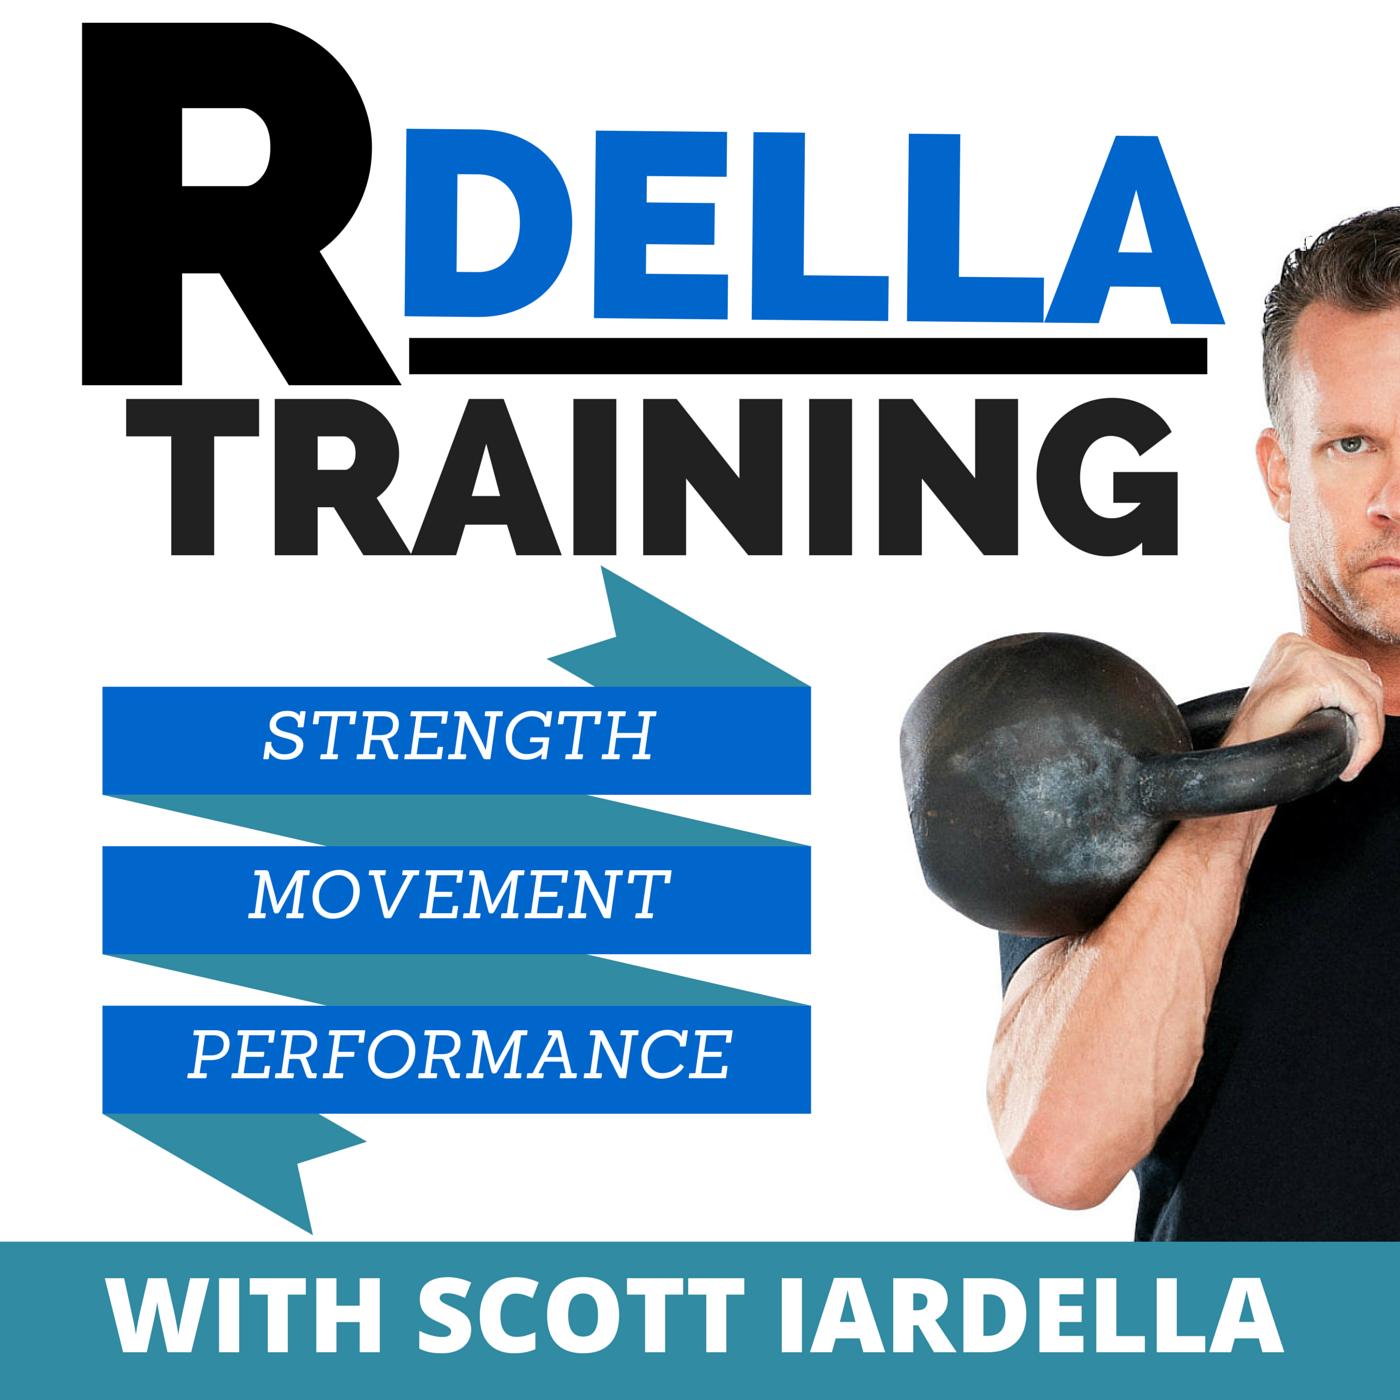 Rdella Training : Strength Training | Kettlebells | Weightlifting | Fitness | Injury Prevention | Nutrition | Peak Performance